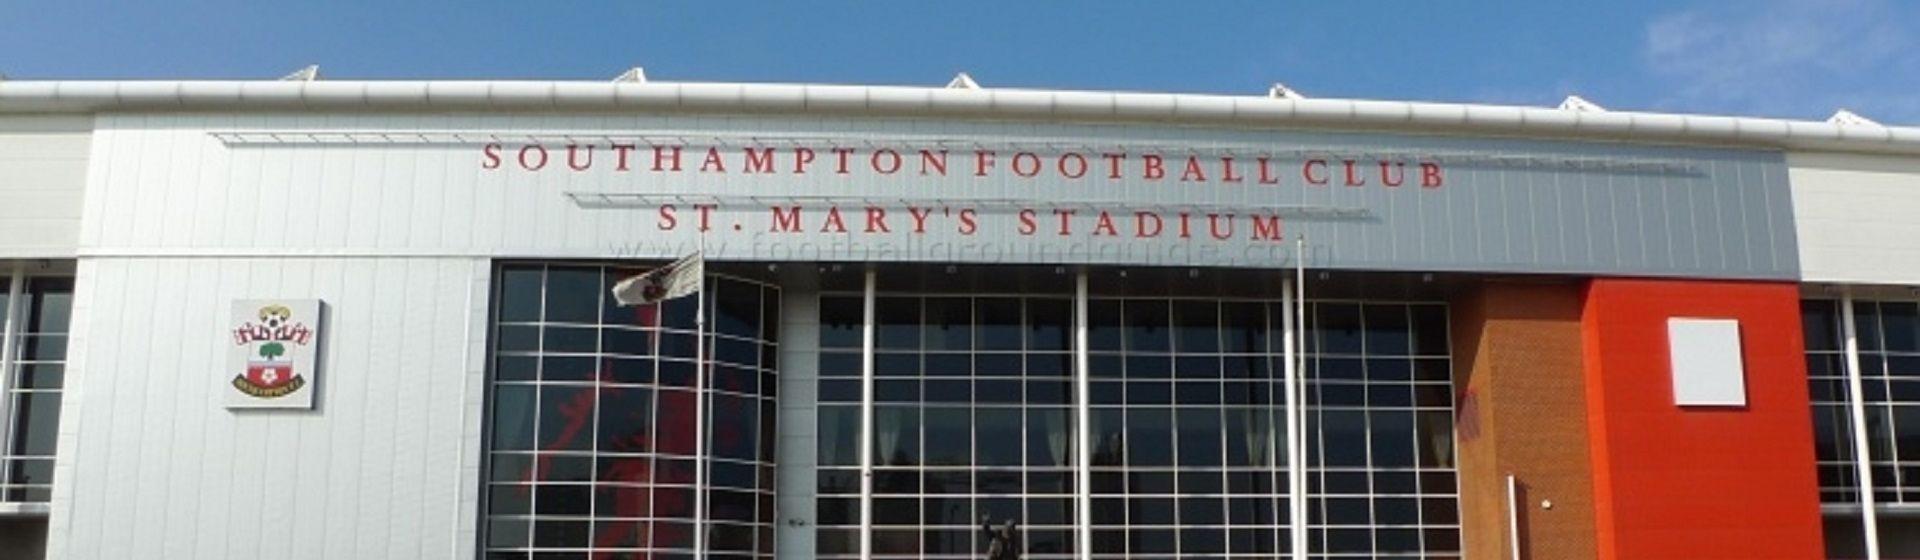 st-marys-stadium-southampton-external-view-1411654792